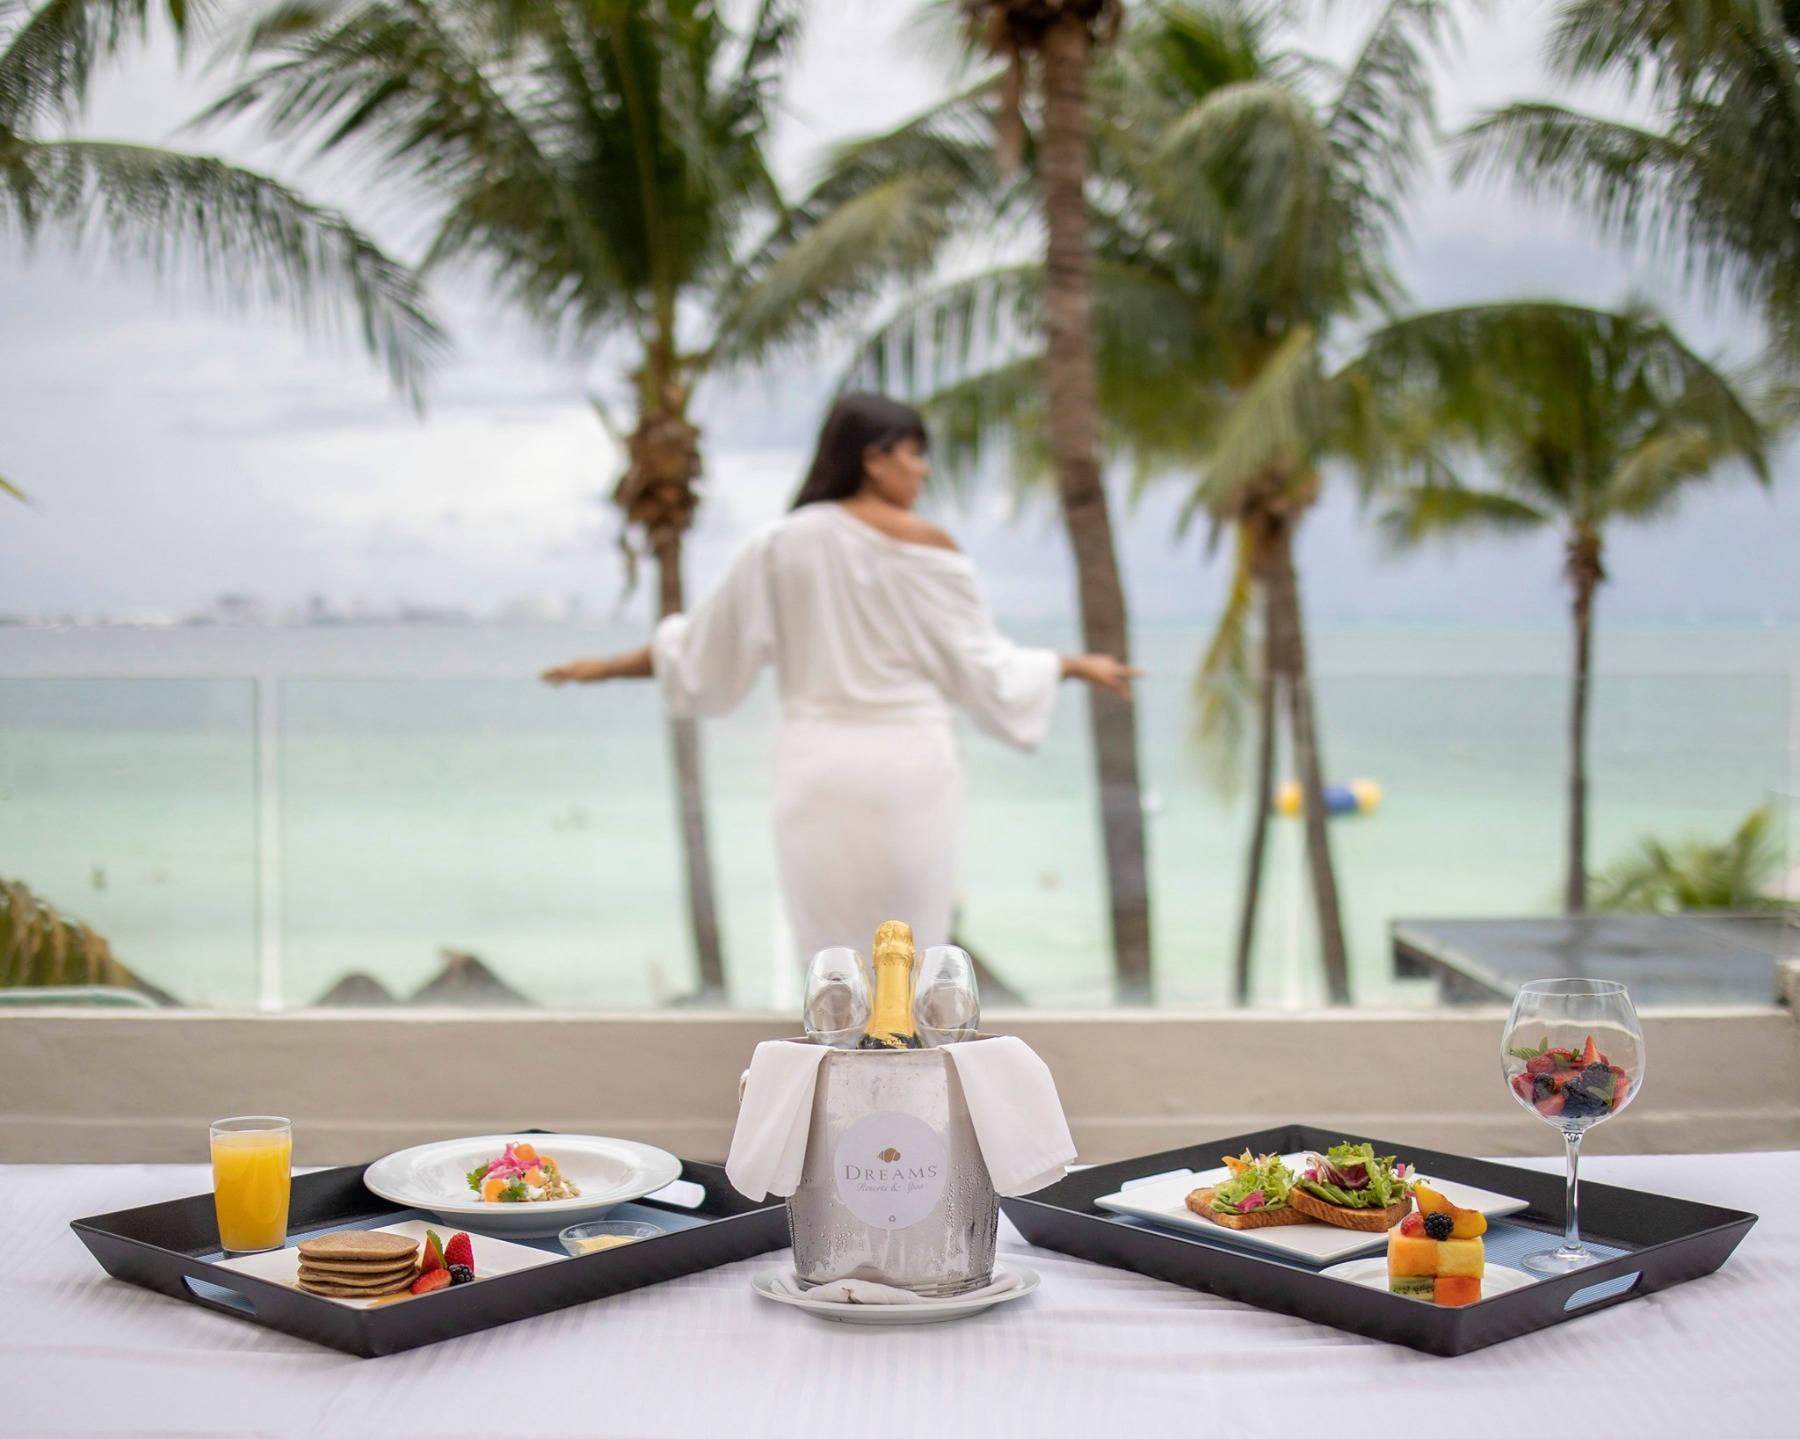 Woman at breakfast overlooking the sea